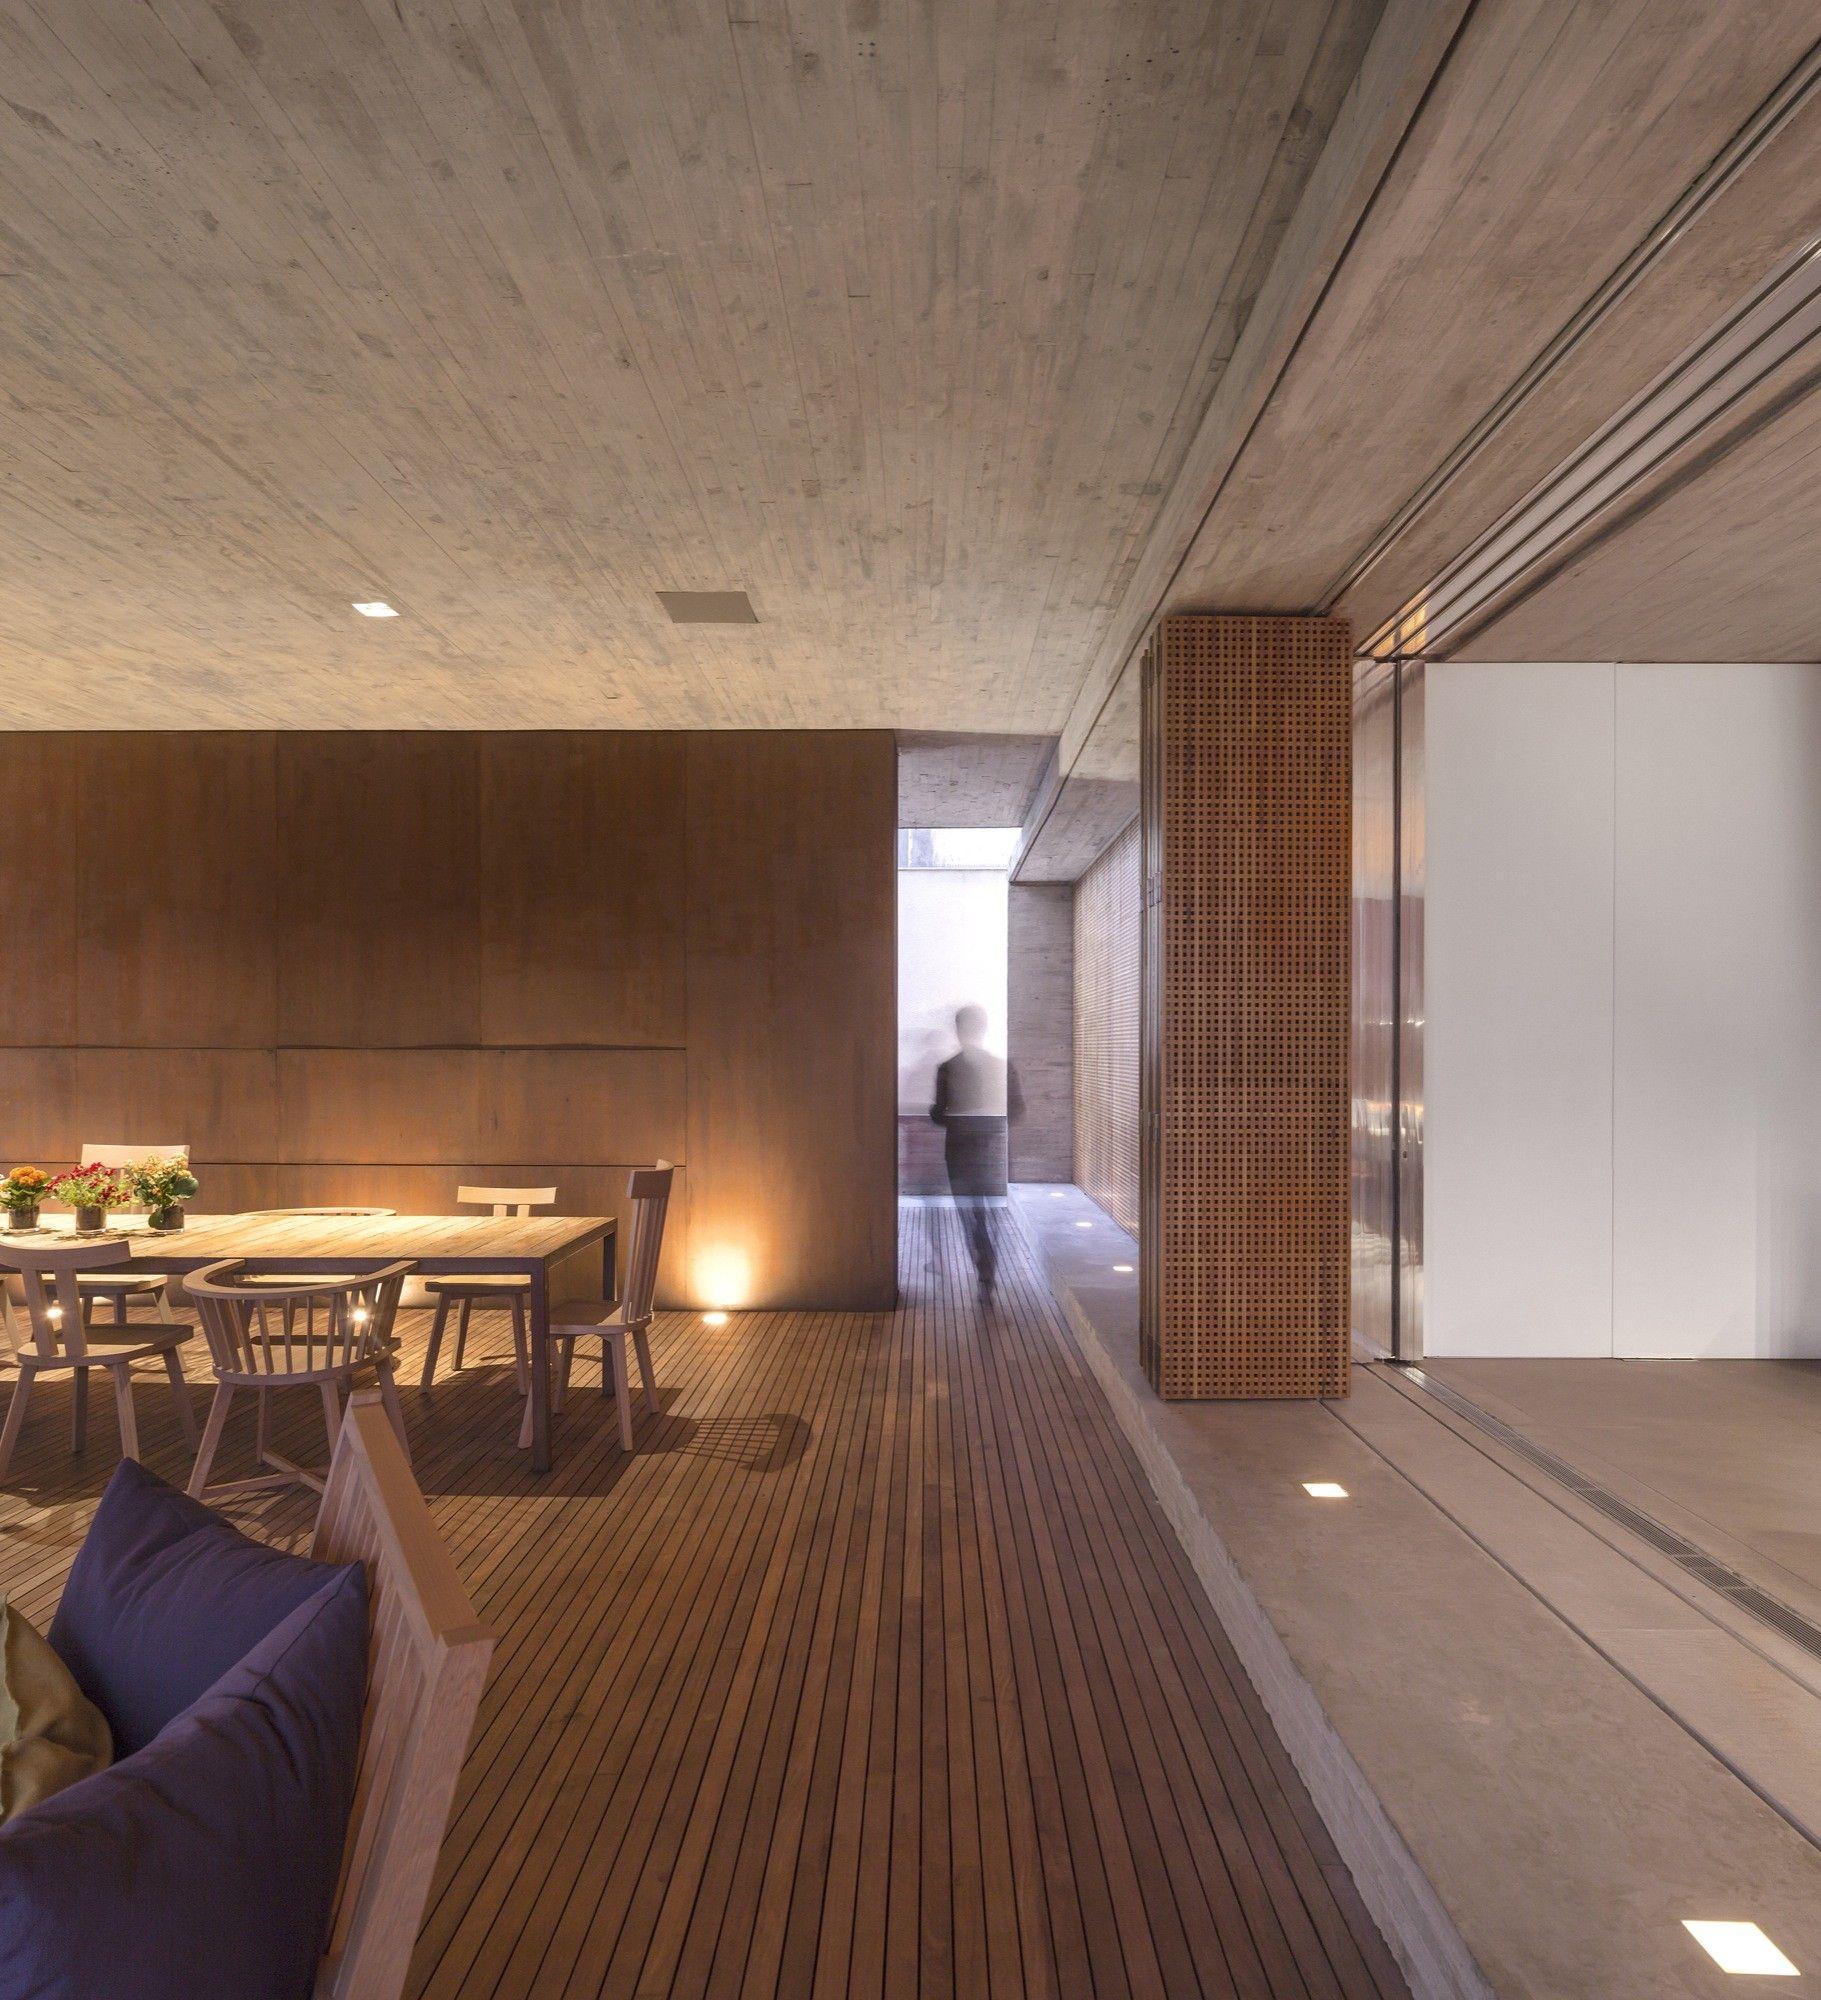 Open layout house concept by studio mk27 - Gallery Of The P House Studio Mk27 Marcio Kogan Lair Reis 15